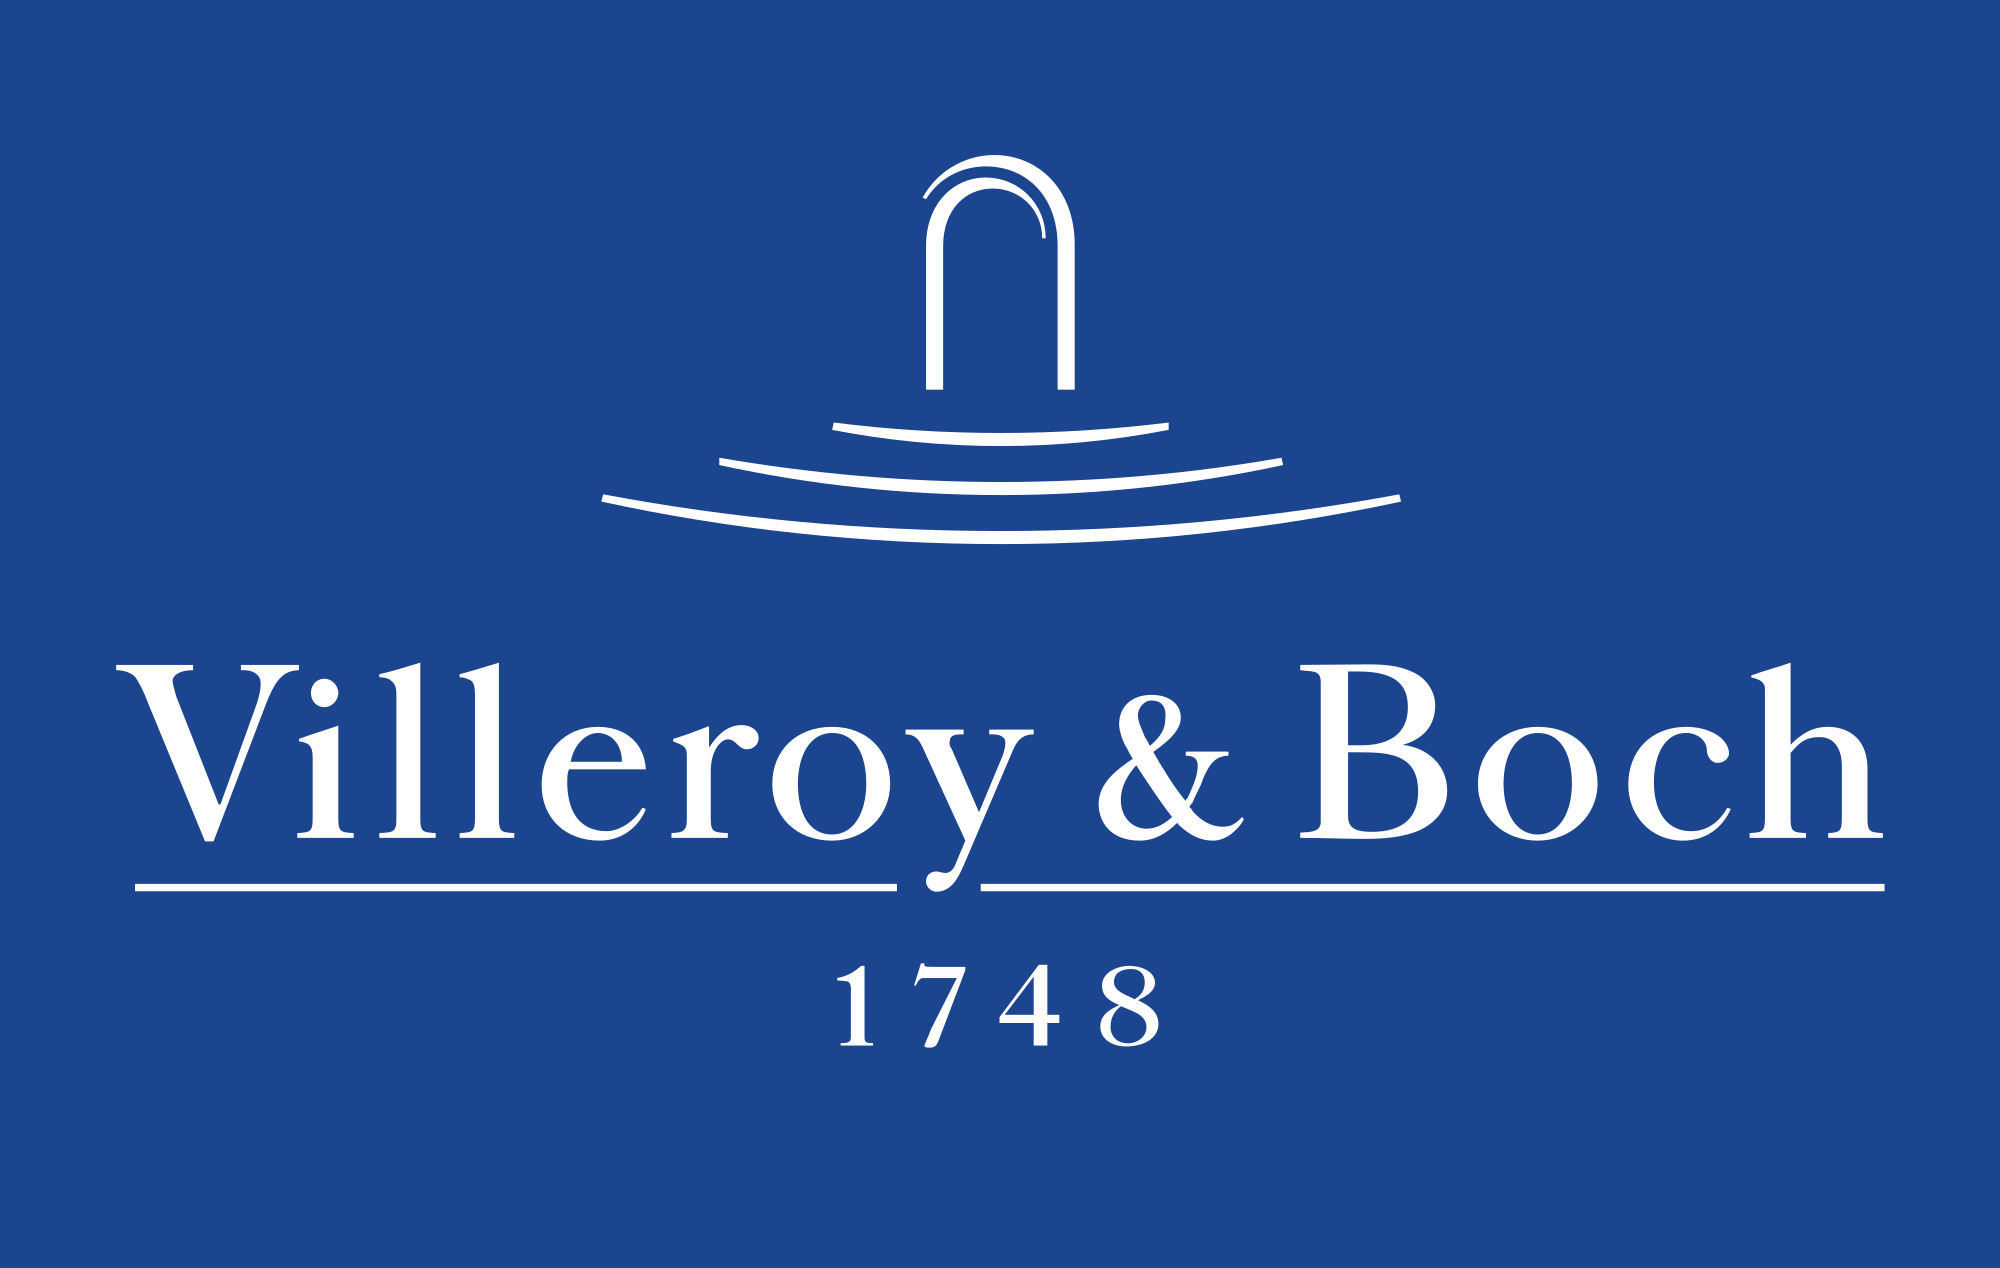 Villeroy Logo Bigmat Roca